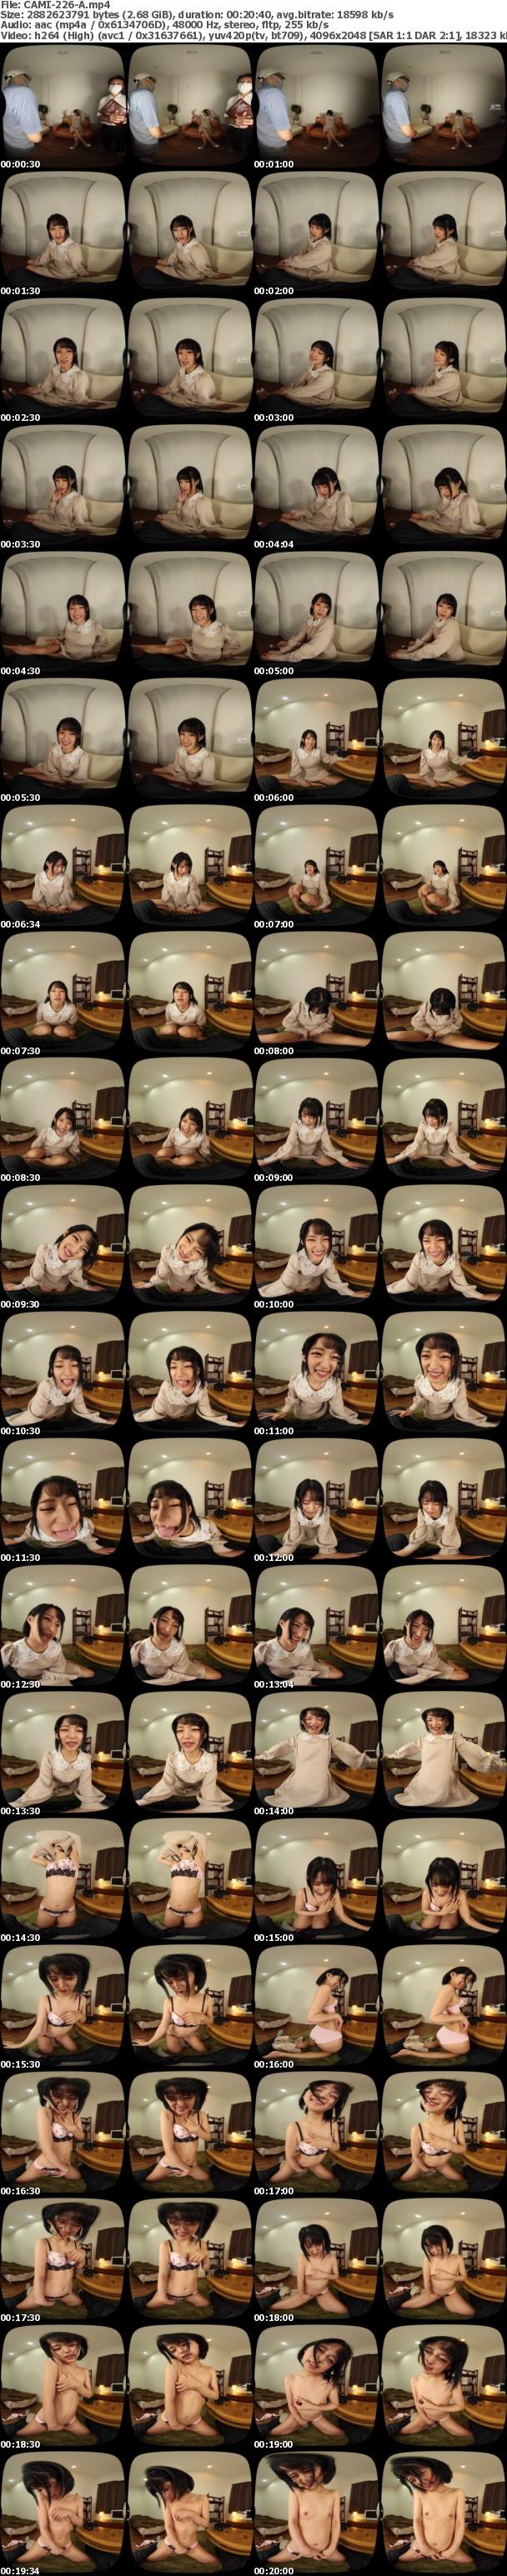 (VR) CAMI-226 出会い喫茶で知り合ったスーパー美女の誘惑円光 渚みつき